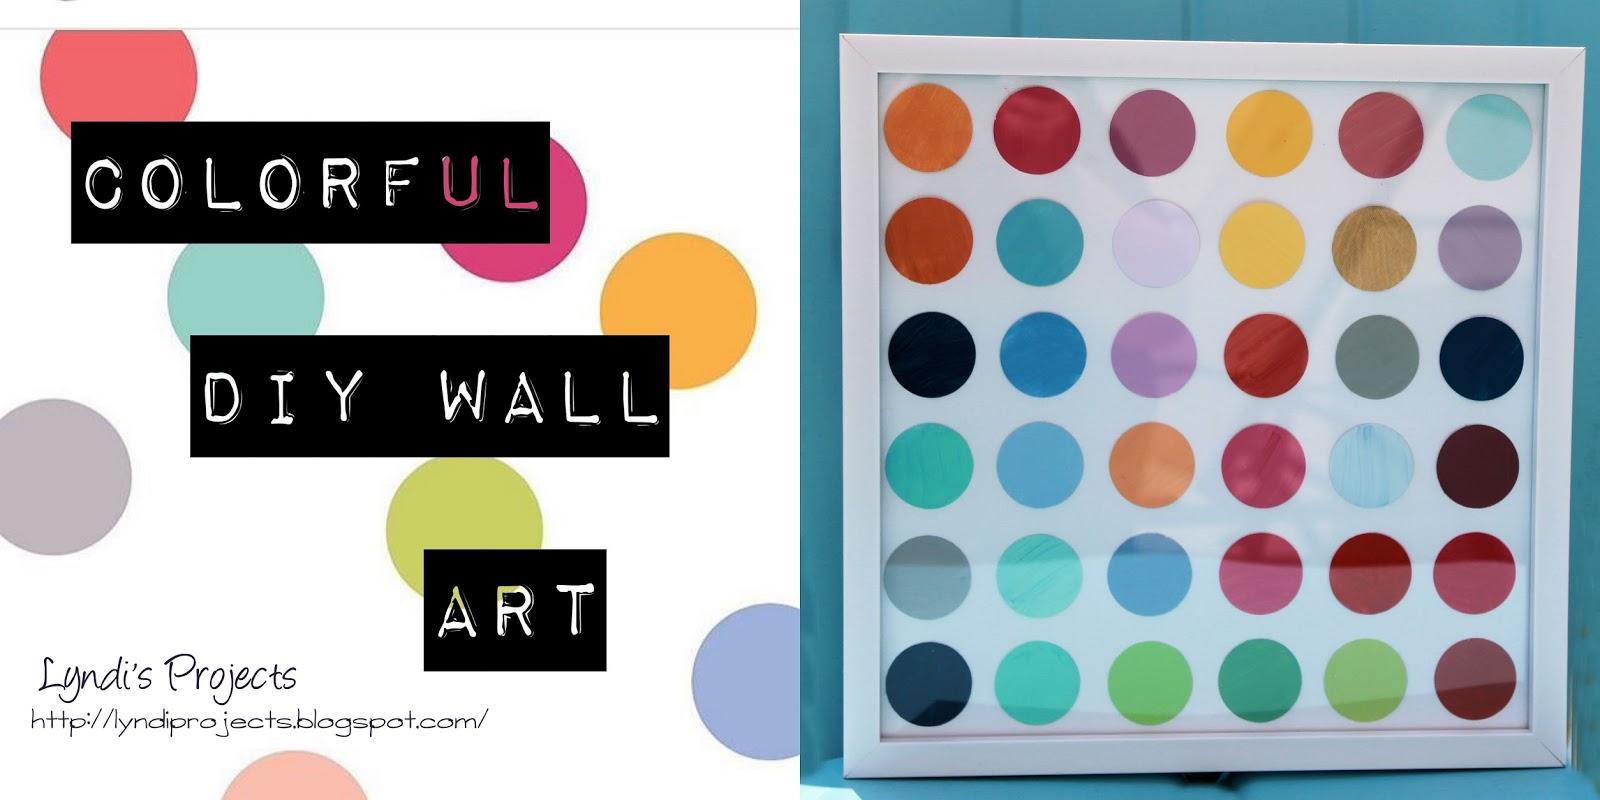 colorful circle wall art, how to make modern colorful wall art